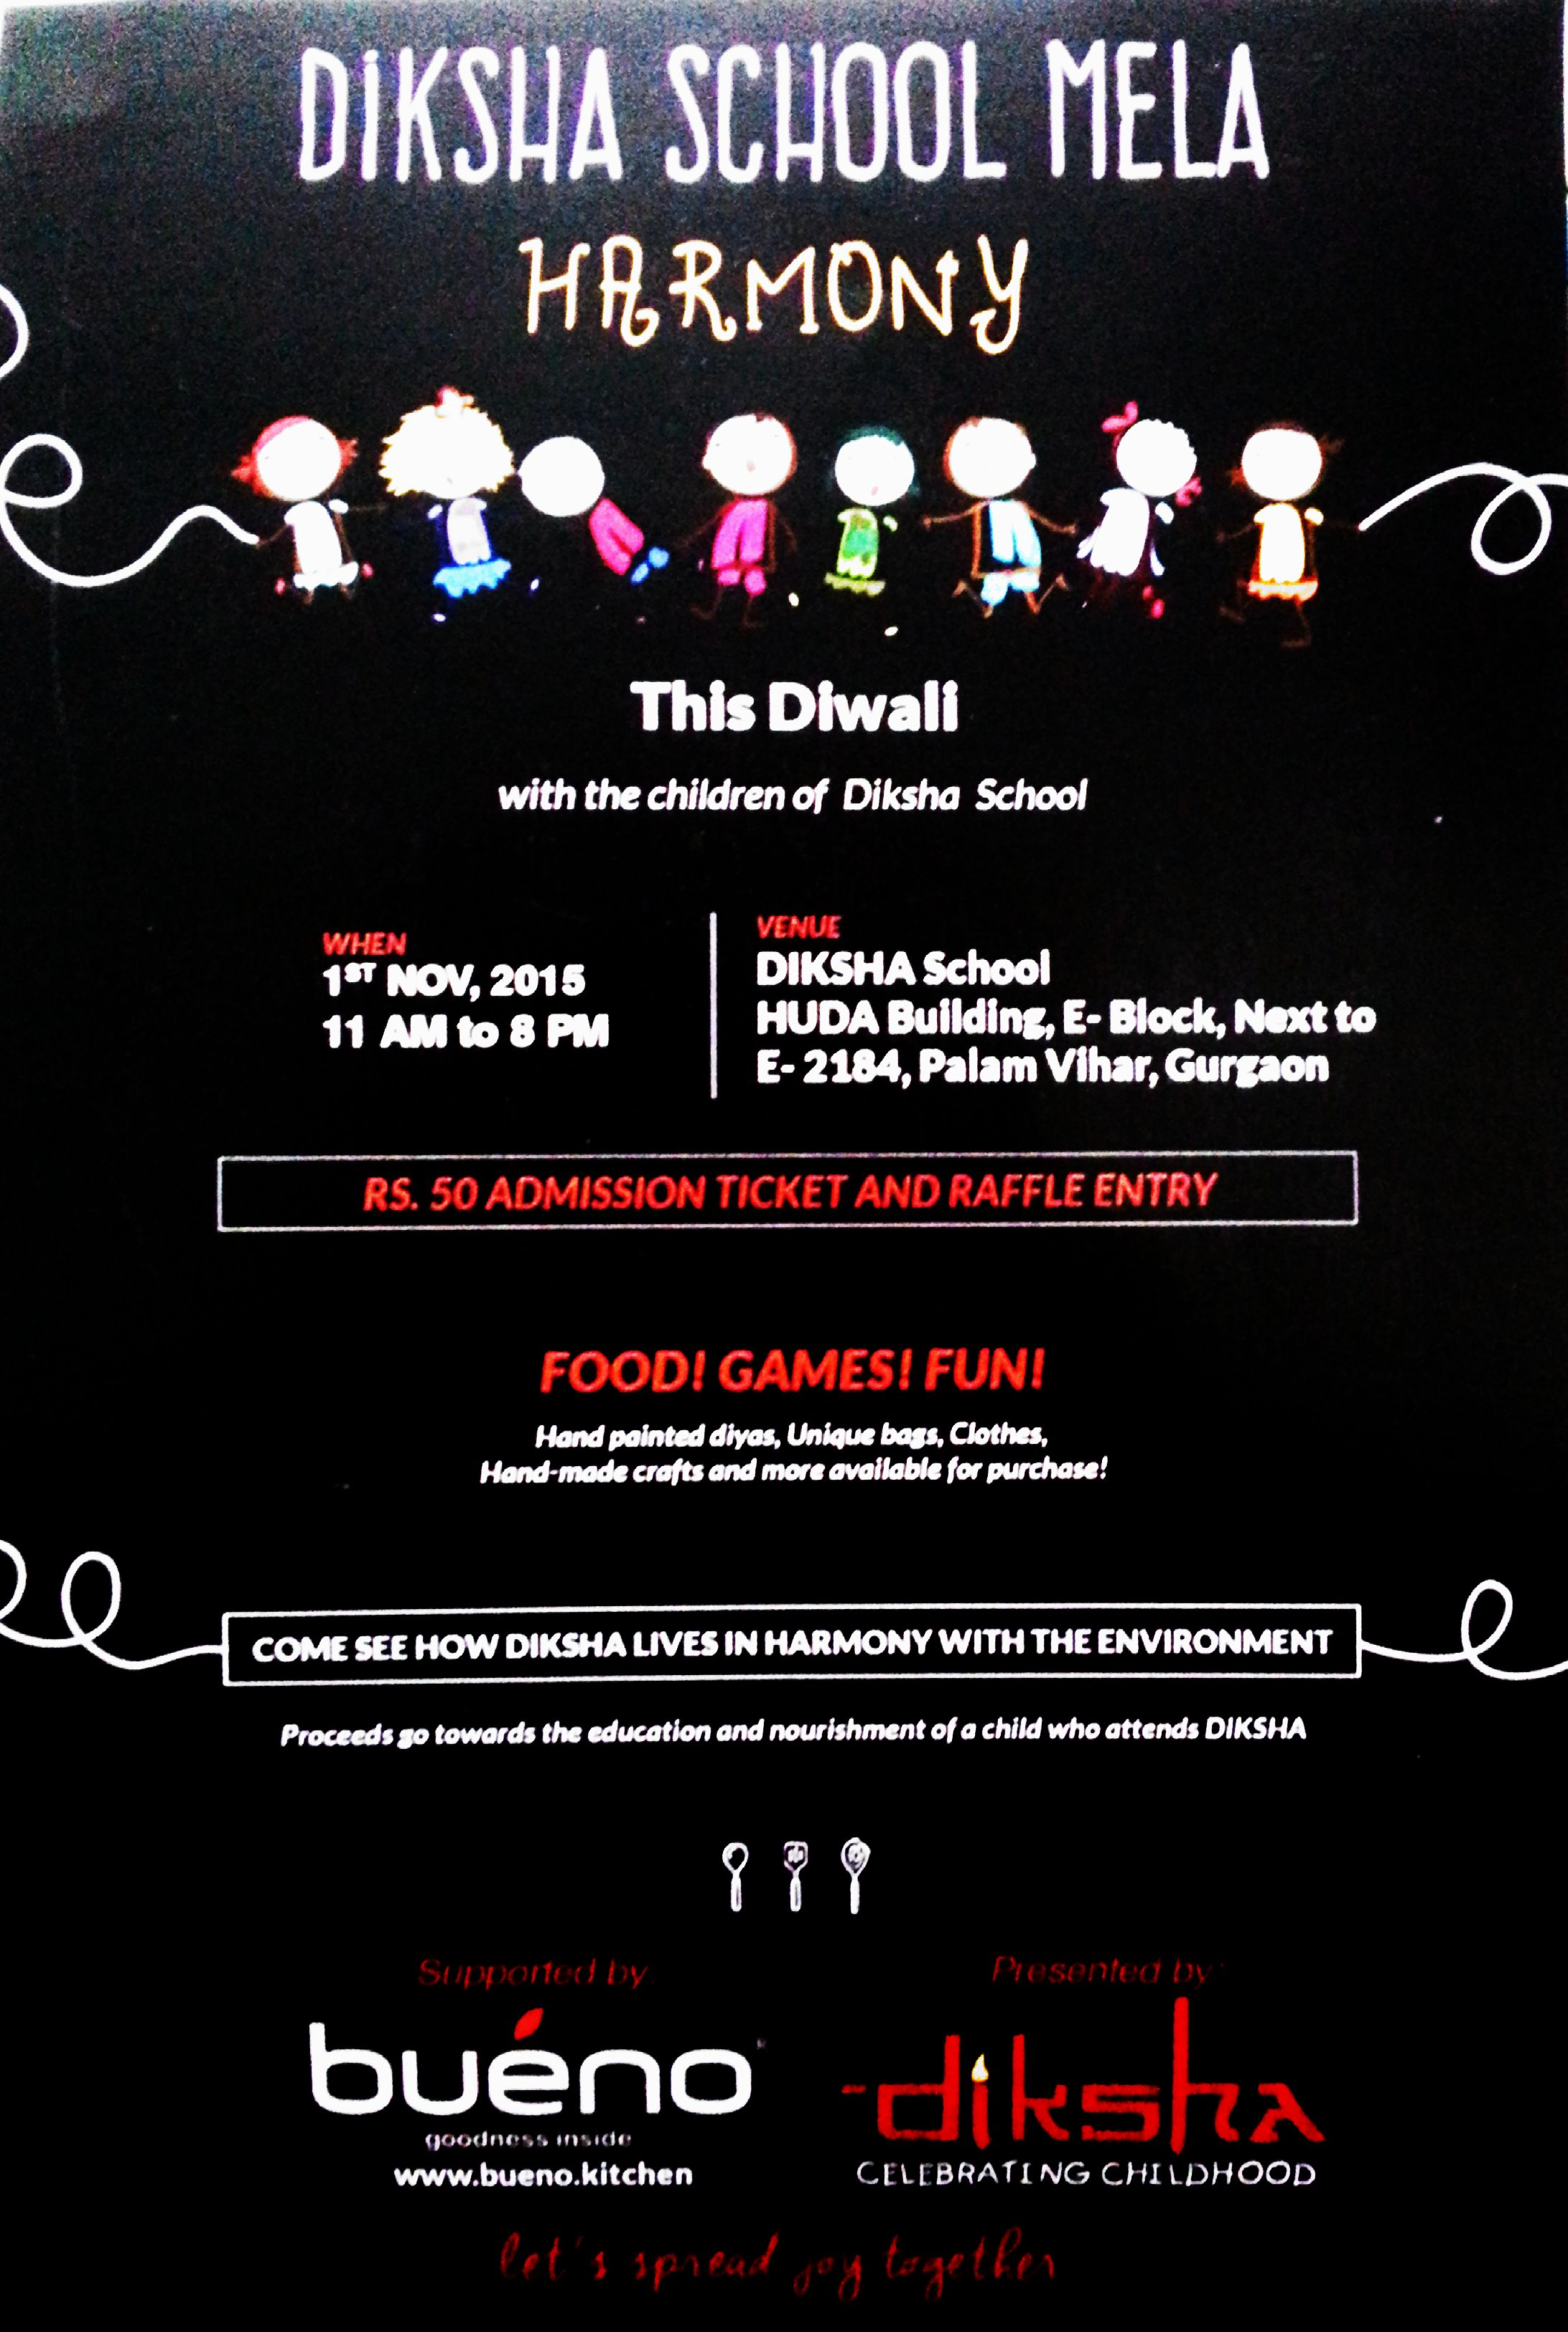 5085 Delhi Ave Delhi: Helping To Spread The Love- DIKSHA SCHOOL DIWALI MELA